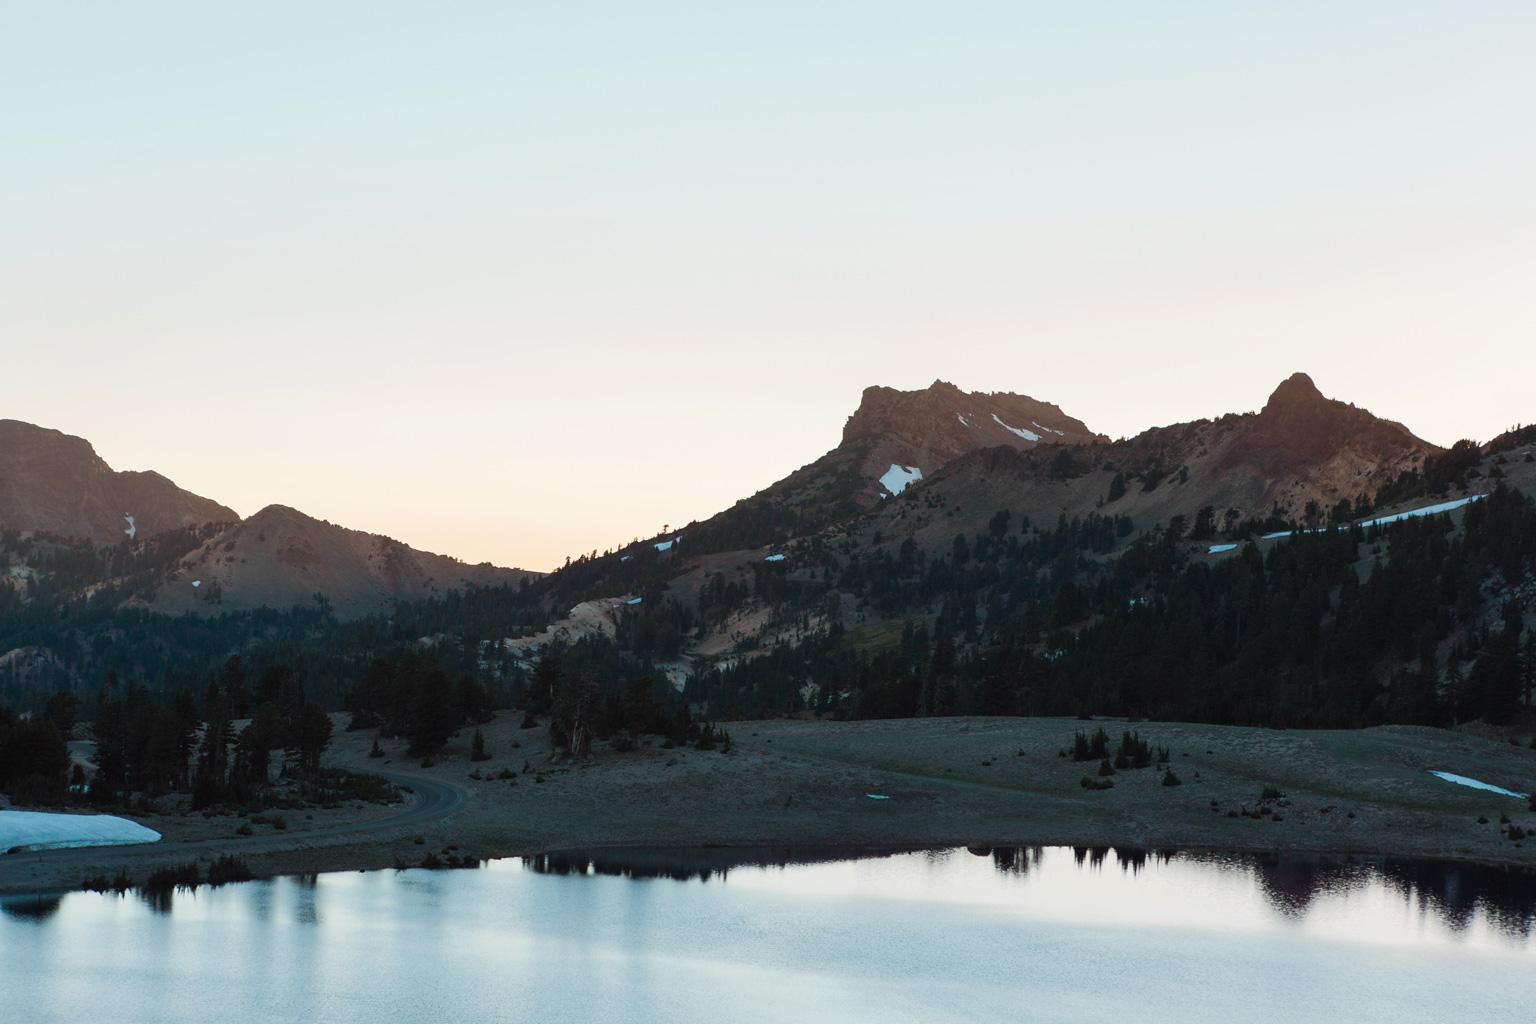 CindyGiovagnoli_Lassen_Volcanic_National_Park_California_camp_road_trip-021.jpg